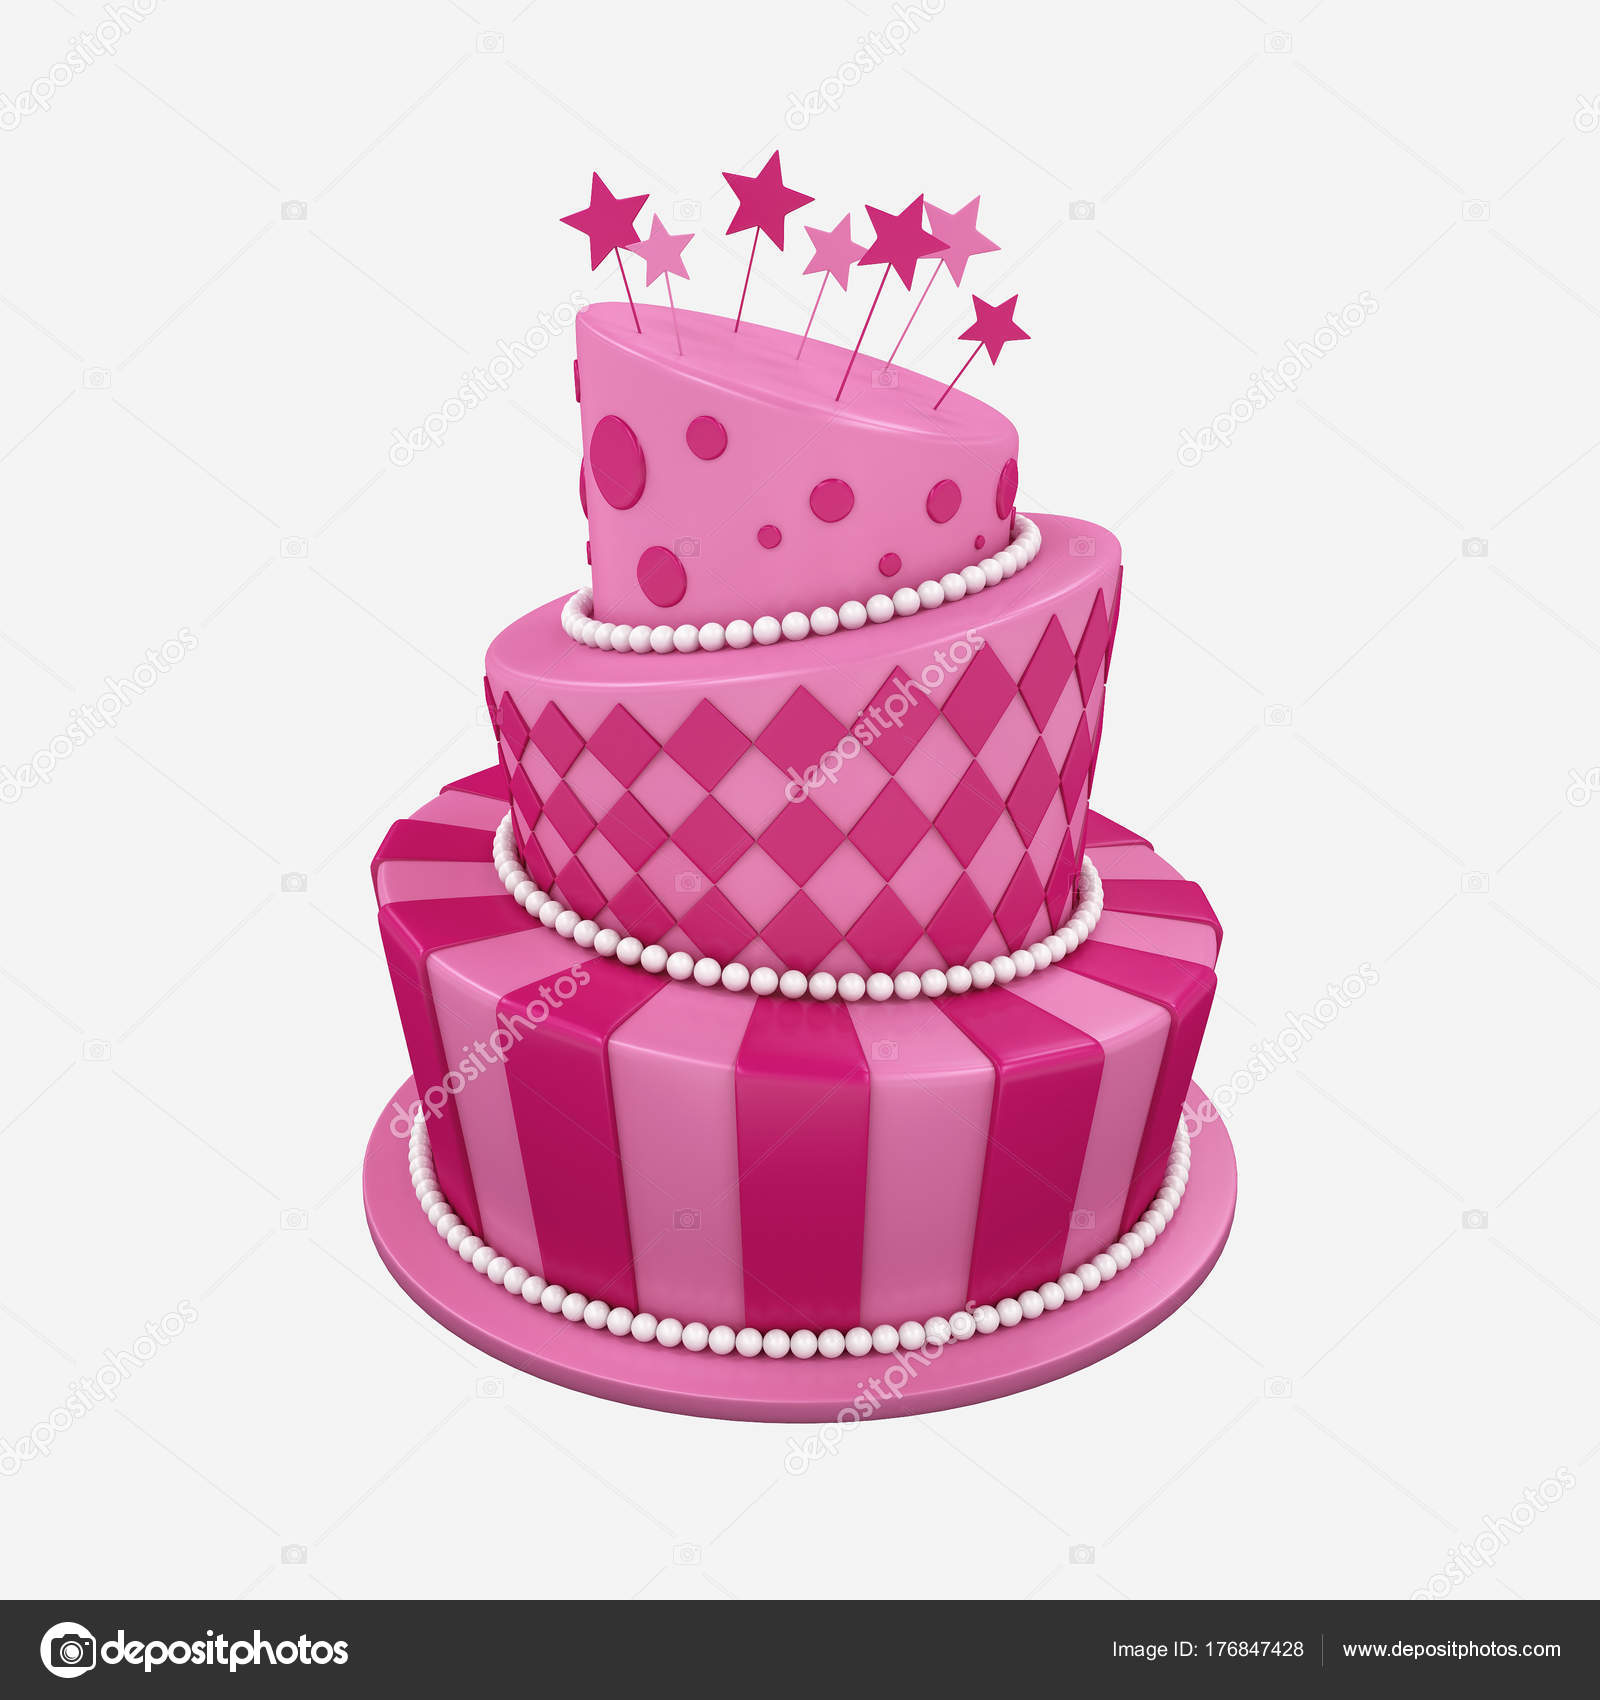 Fabulous Illustration Big Birthday Holiday Three Floor Cake Stock Photo Funny Birthday Cards Online Alyptdamsfinfo